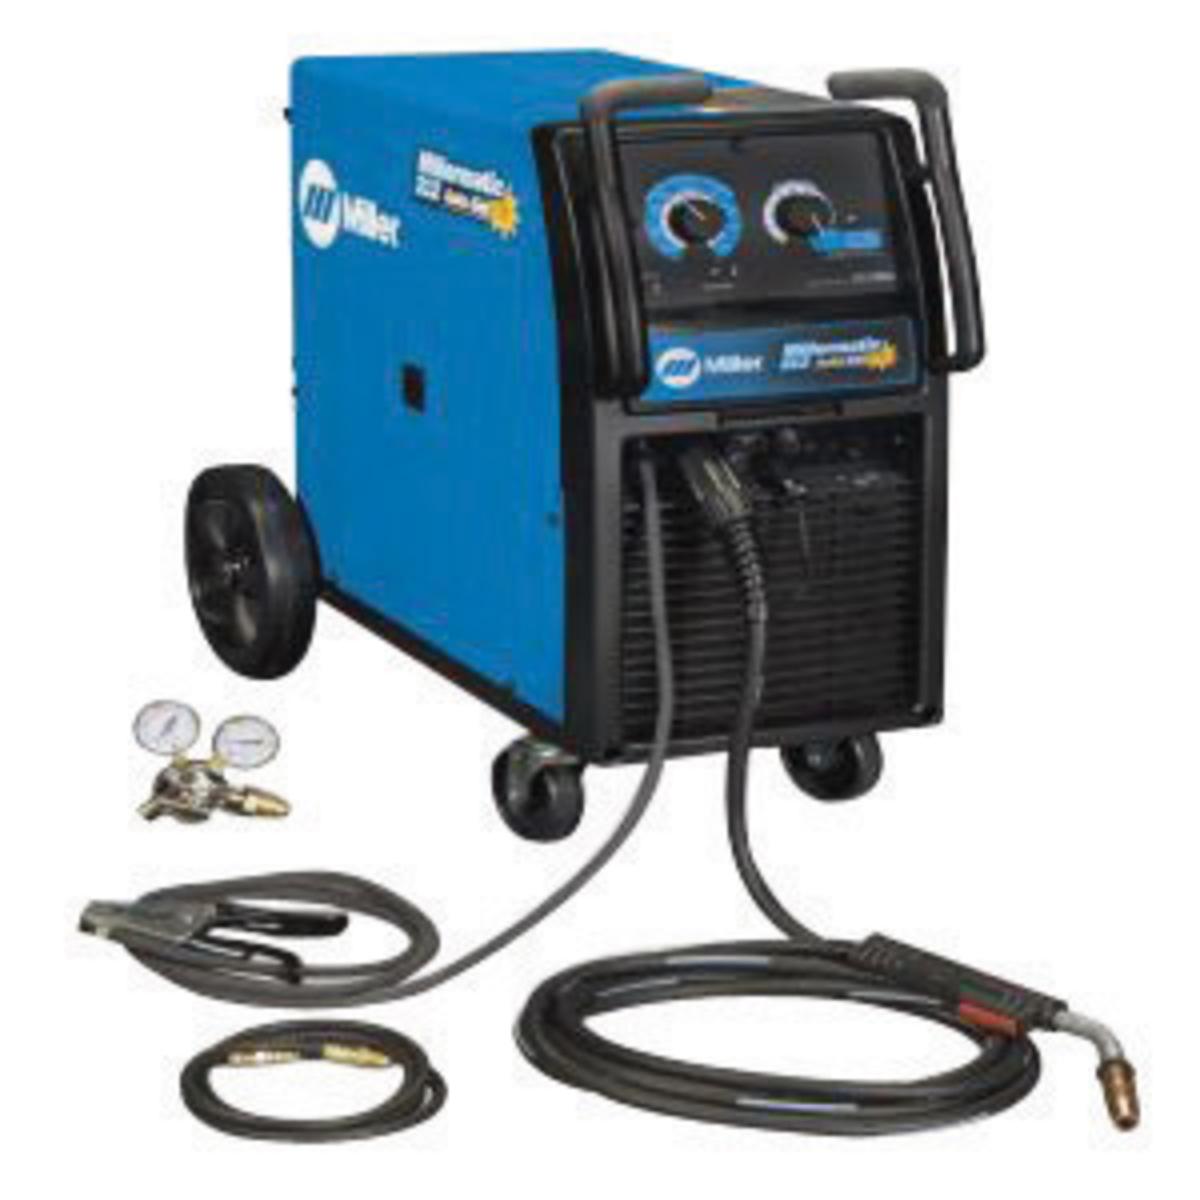 Airgas - MIL907405001 - Miller® Millermatic® 212 Auto-Set™ MIG ...